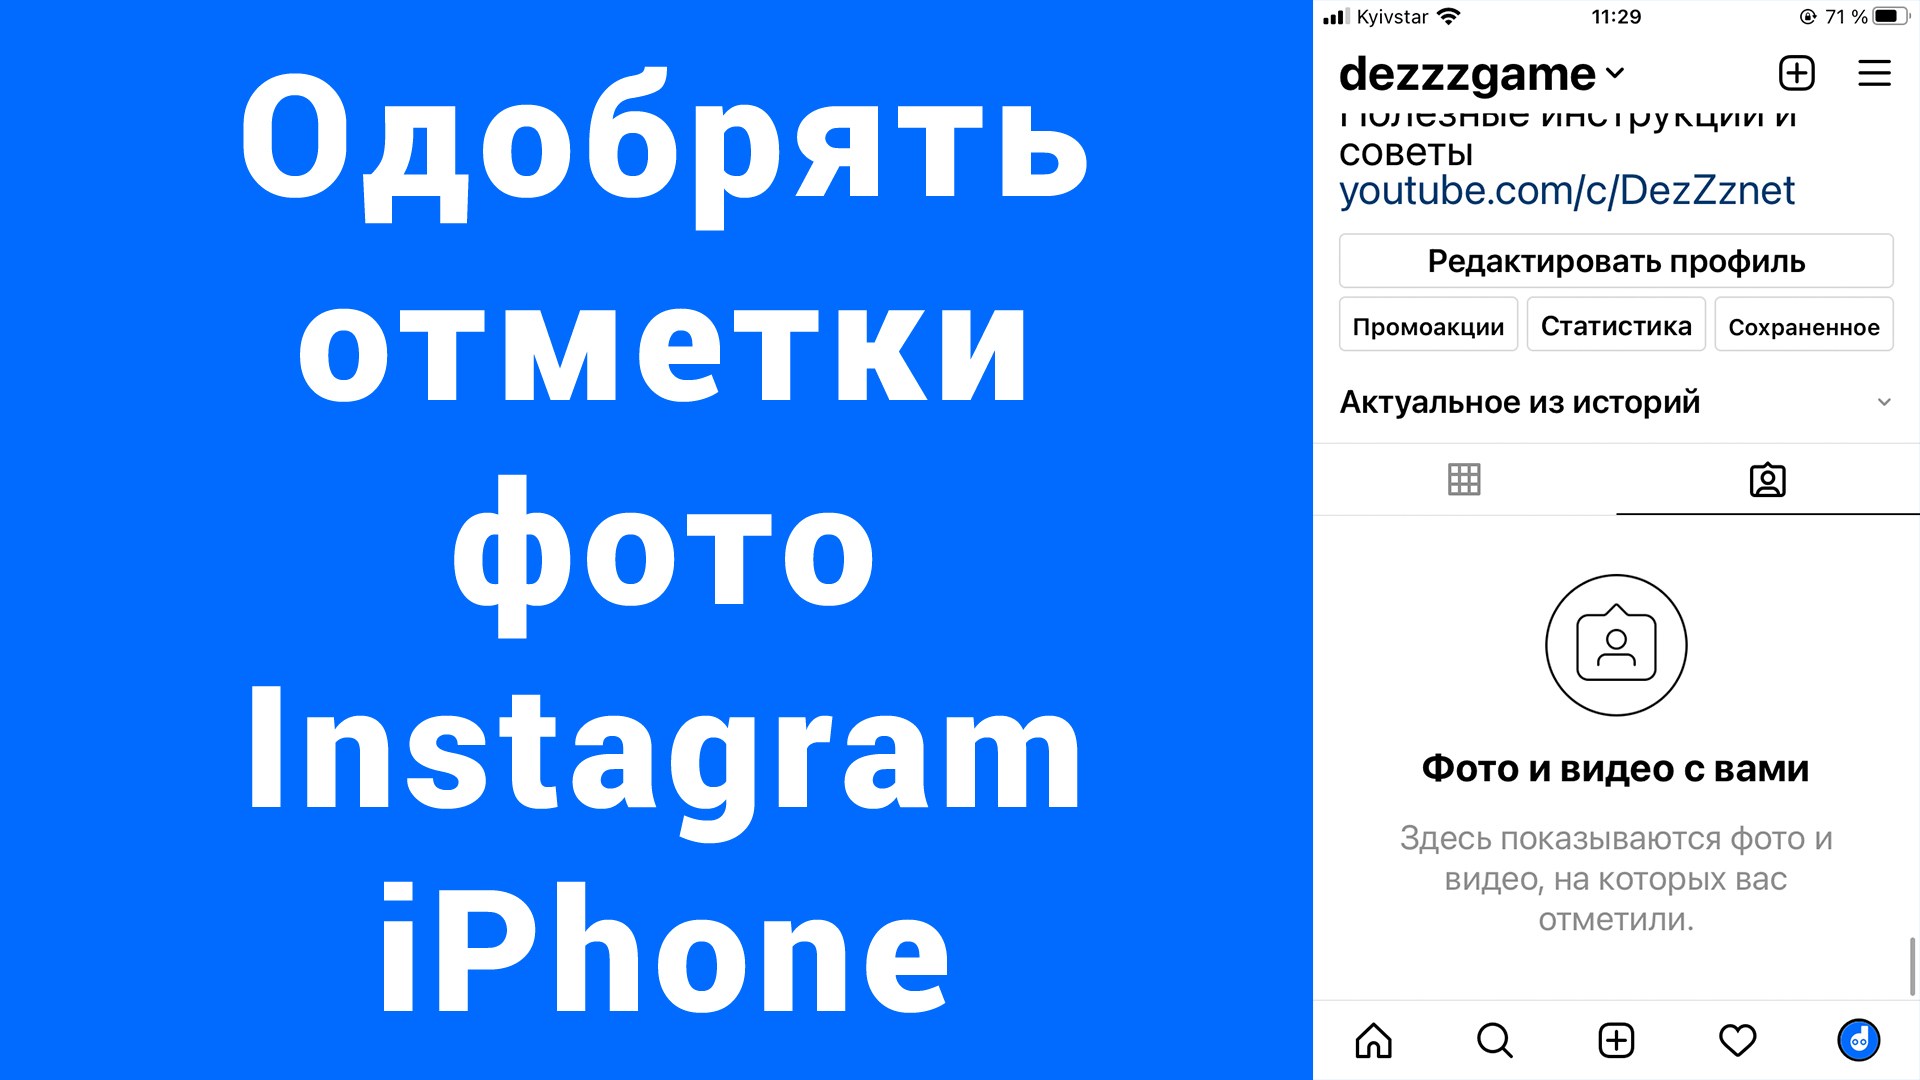 Отметки на фото с одобрением проверкой Instagram iPhone